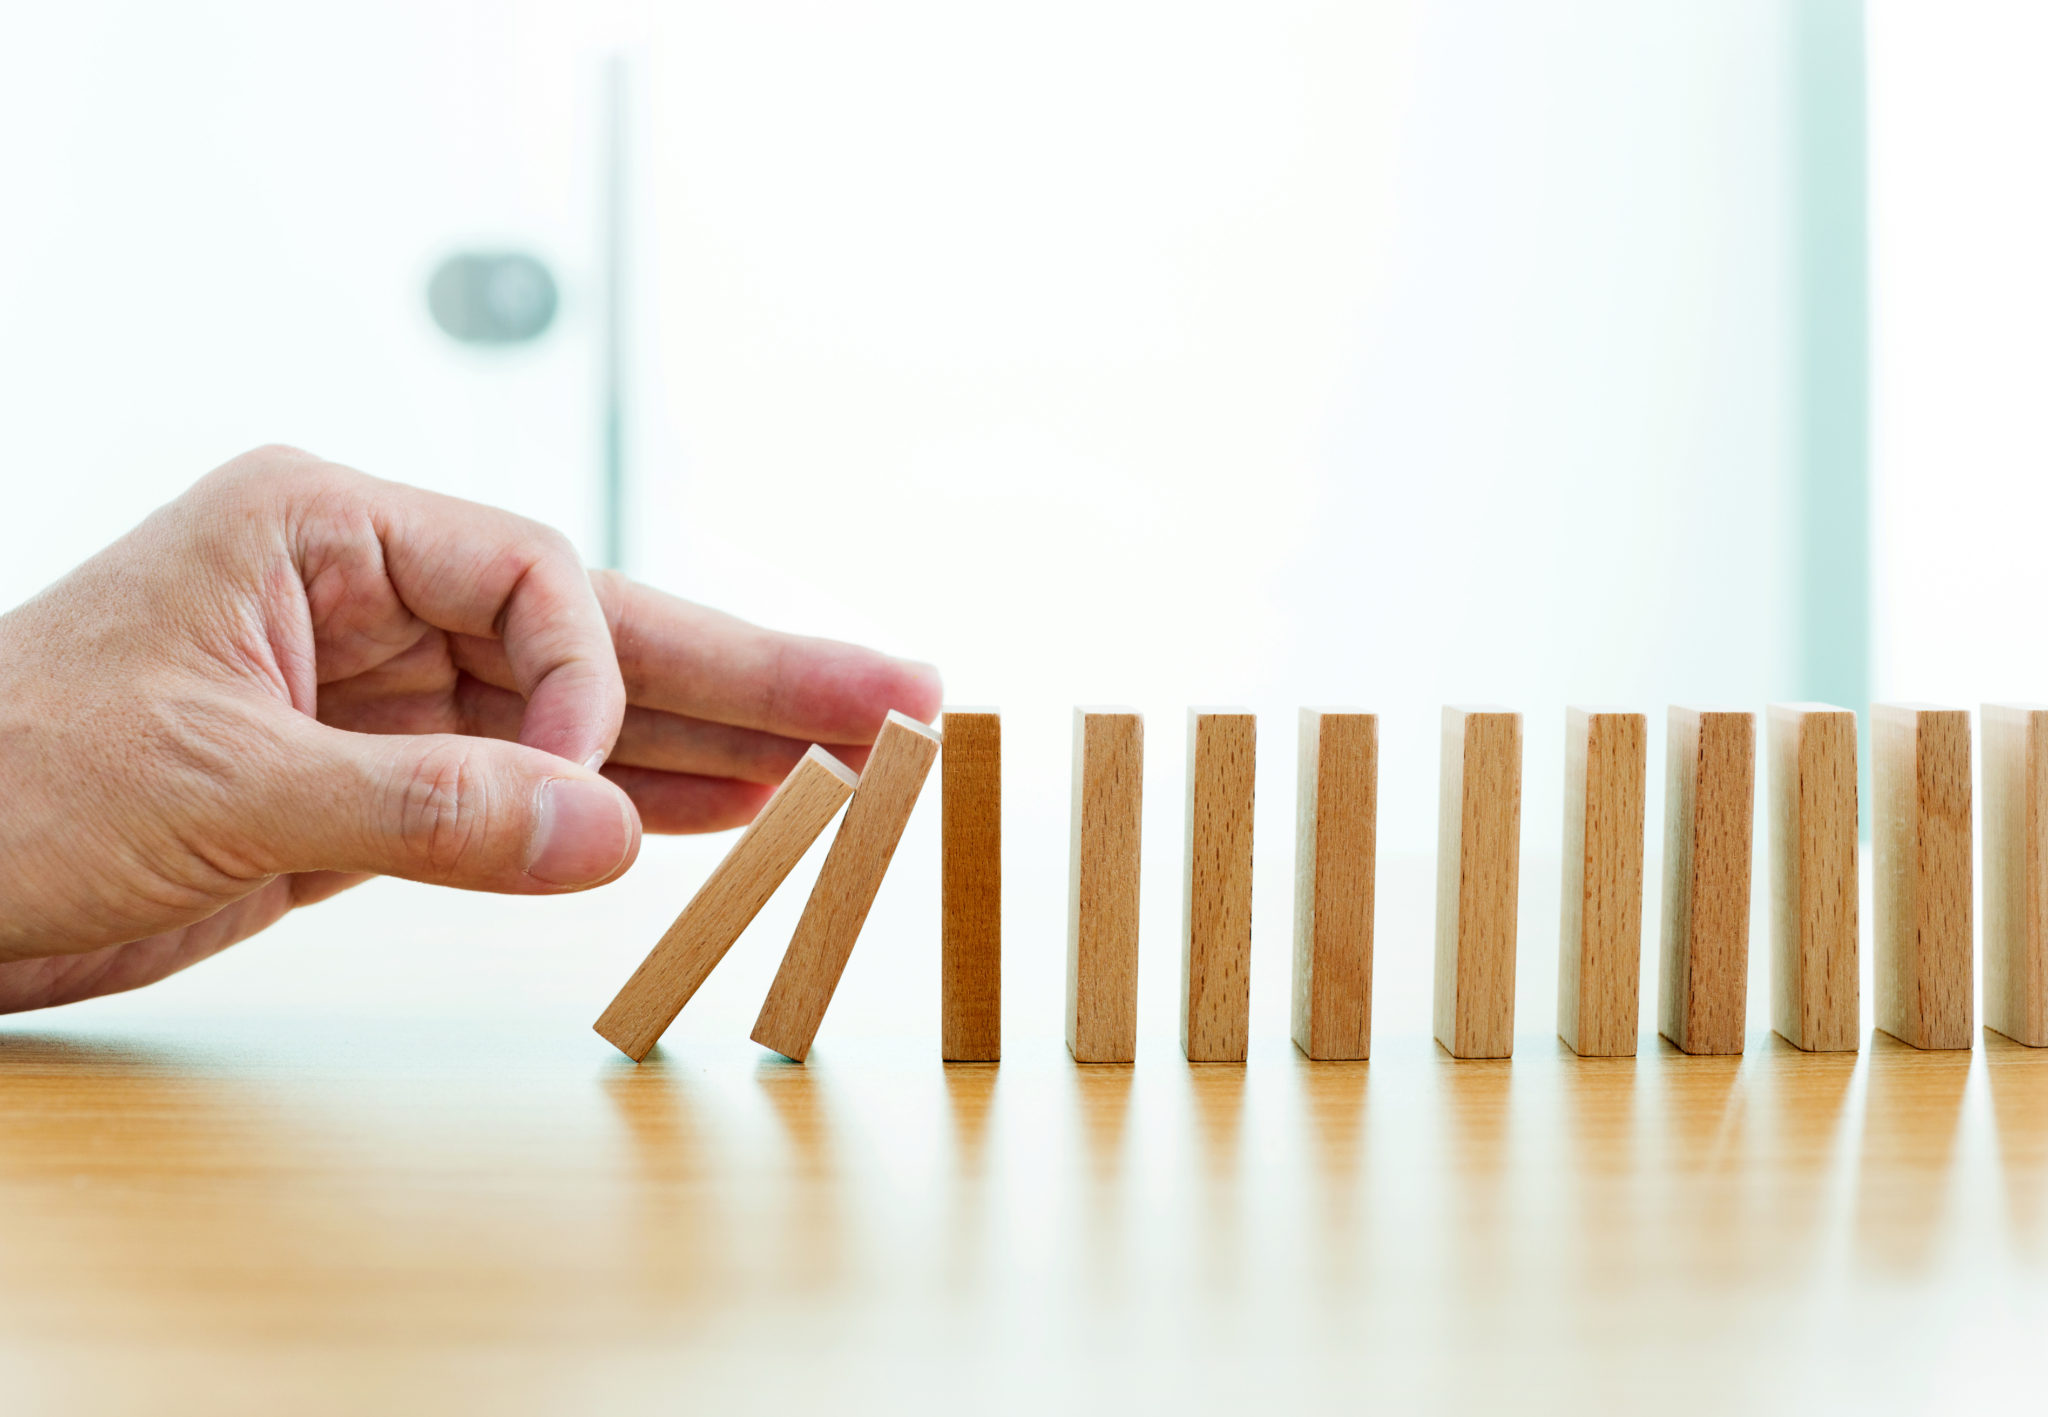 Man hand pushing domino pieces